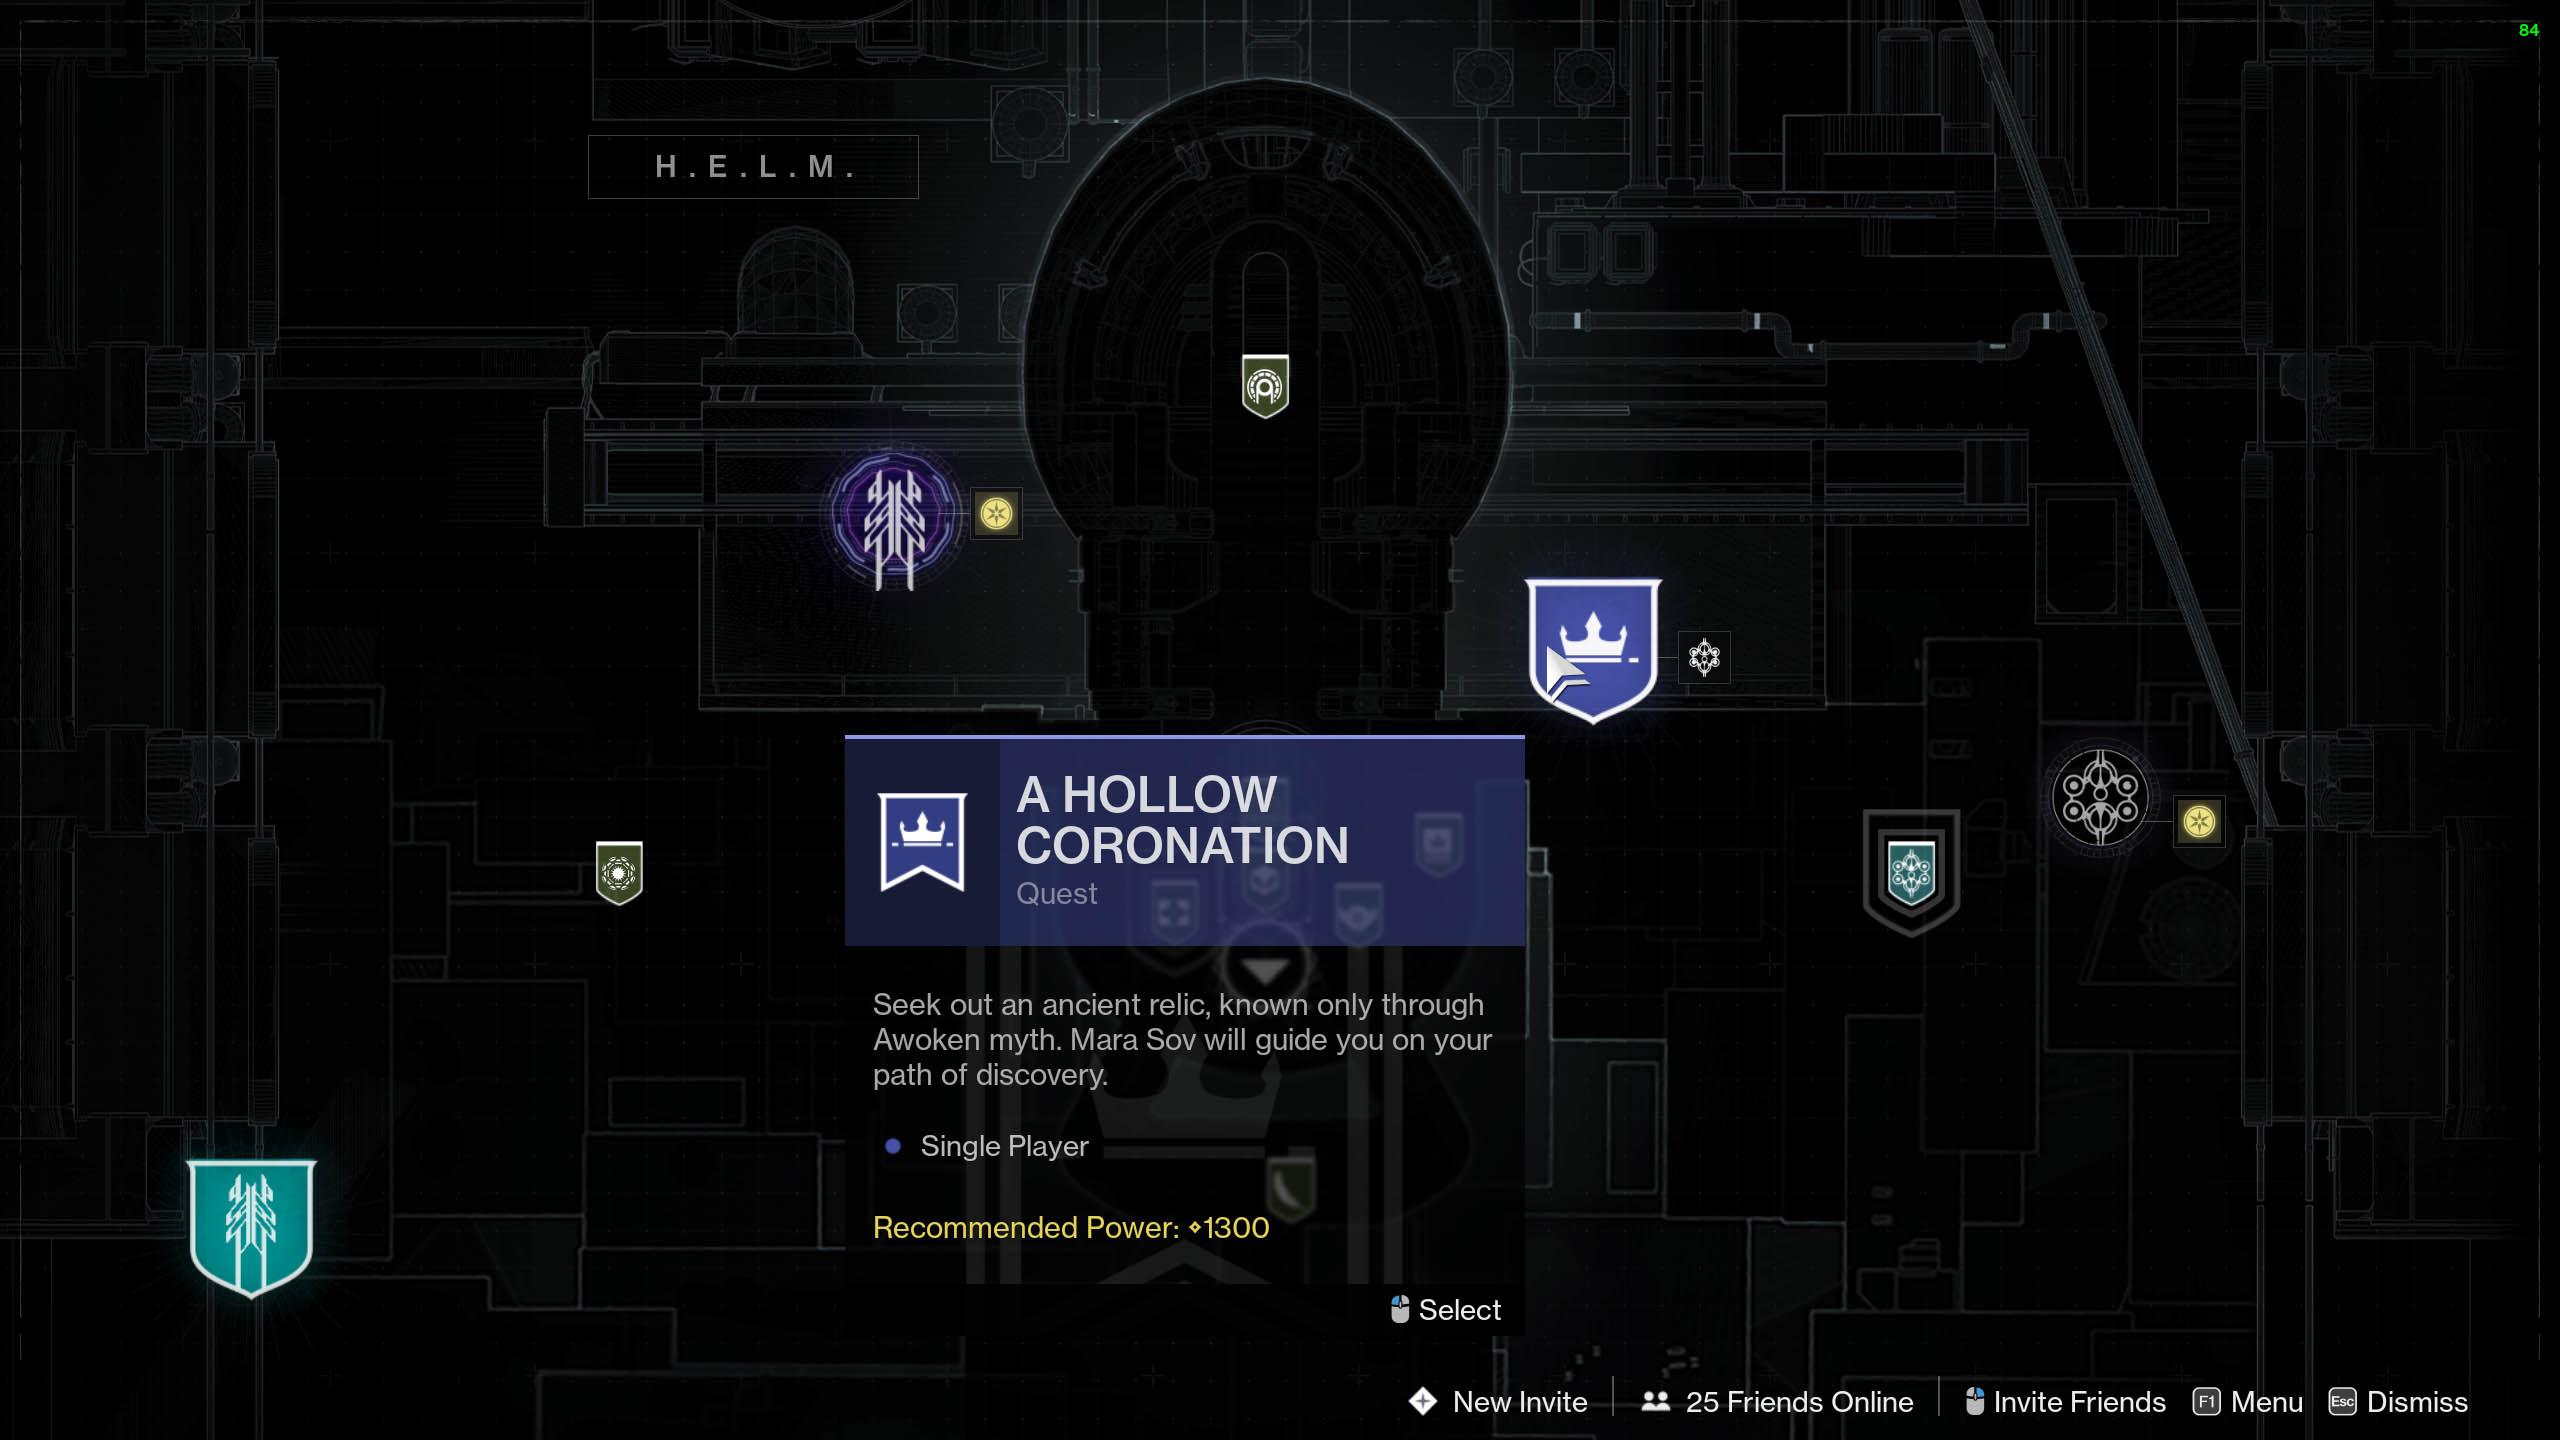 destiny 2 a hollow coronation